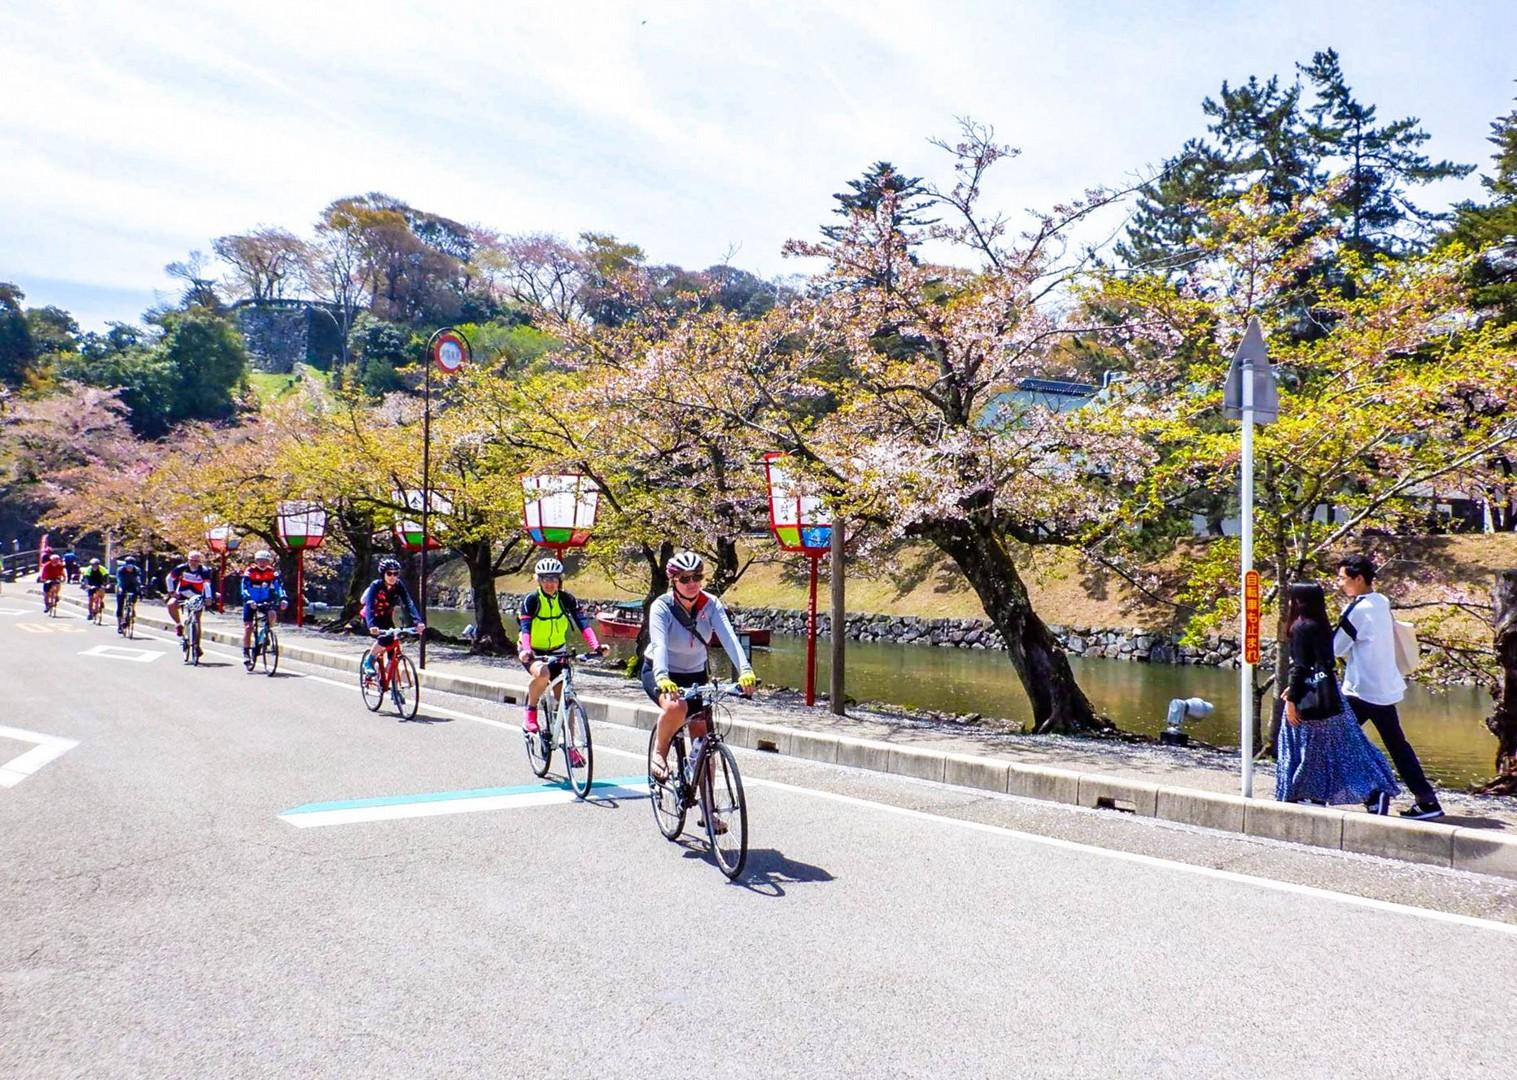 taka_18_apr_DSCF1496.jpg - Japan - Classic Japan - Fuji to Kyoto - Cycling Holiday - Cycling Adventures